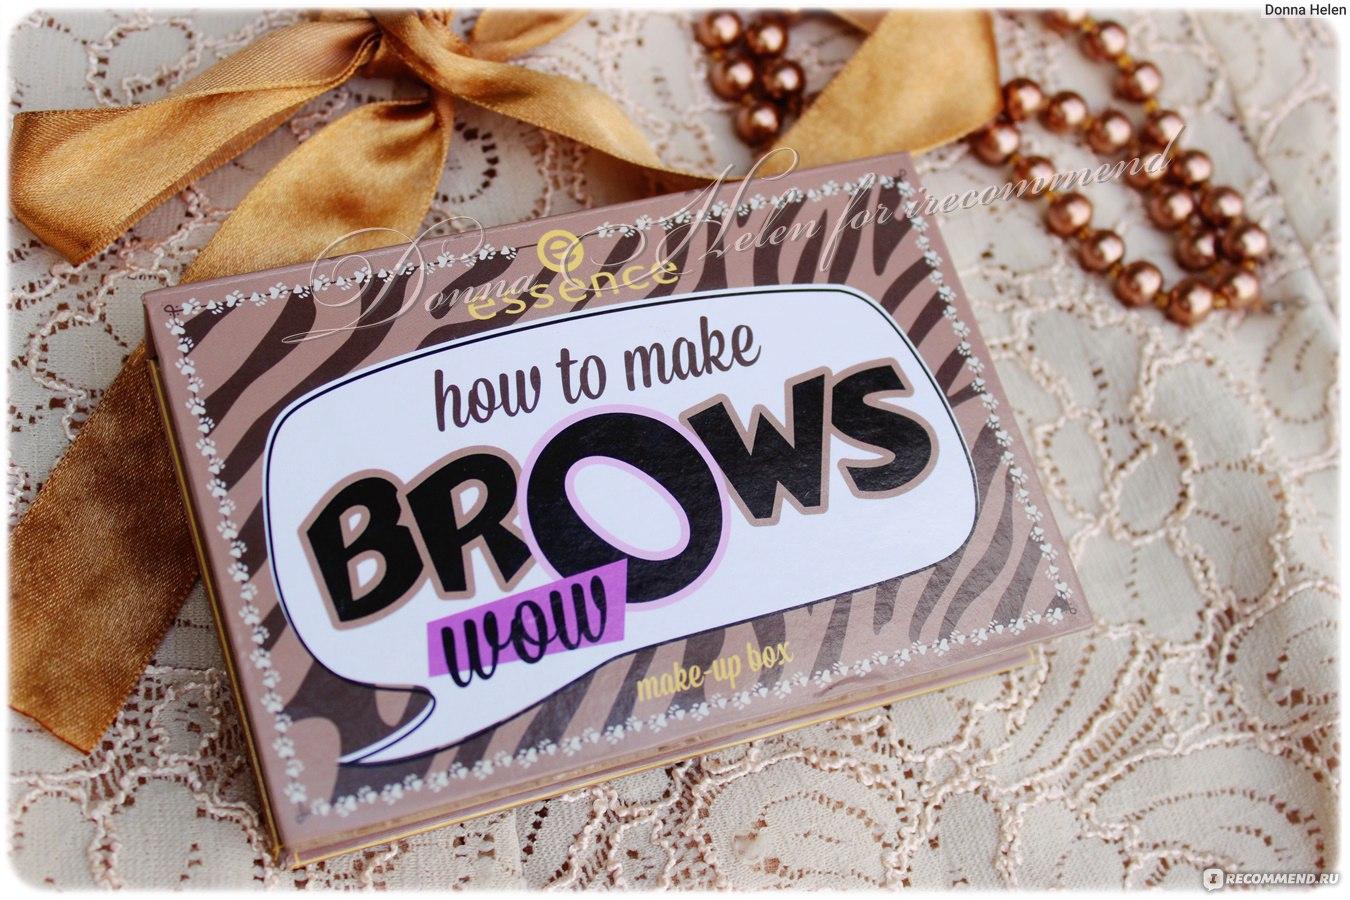 Essence набор для макияжа бровей how to make brows wow отзывы